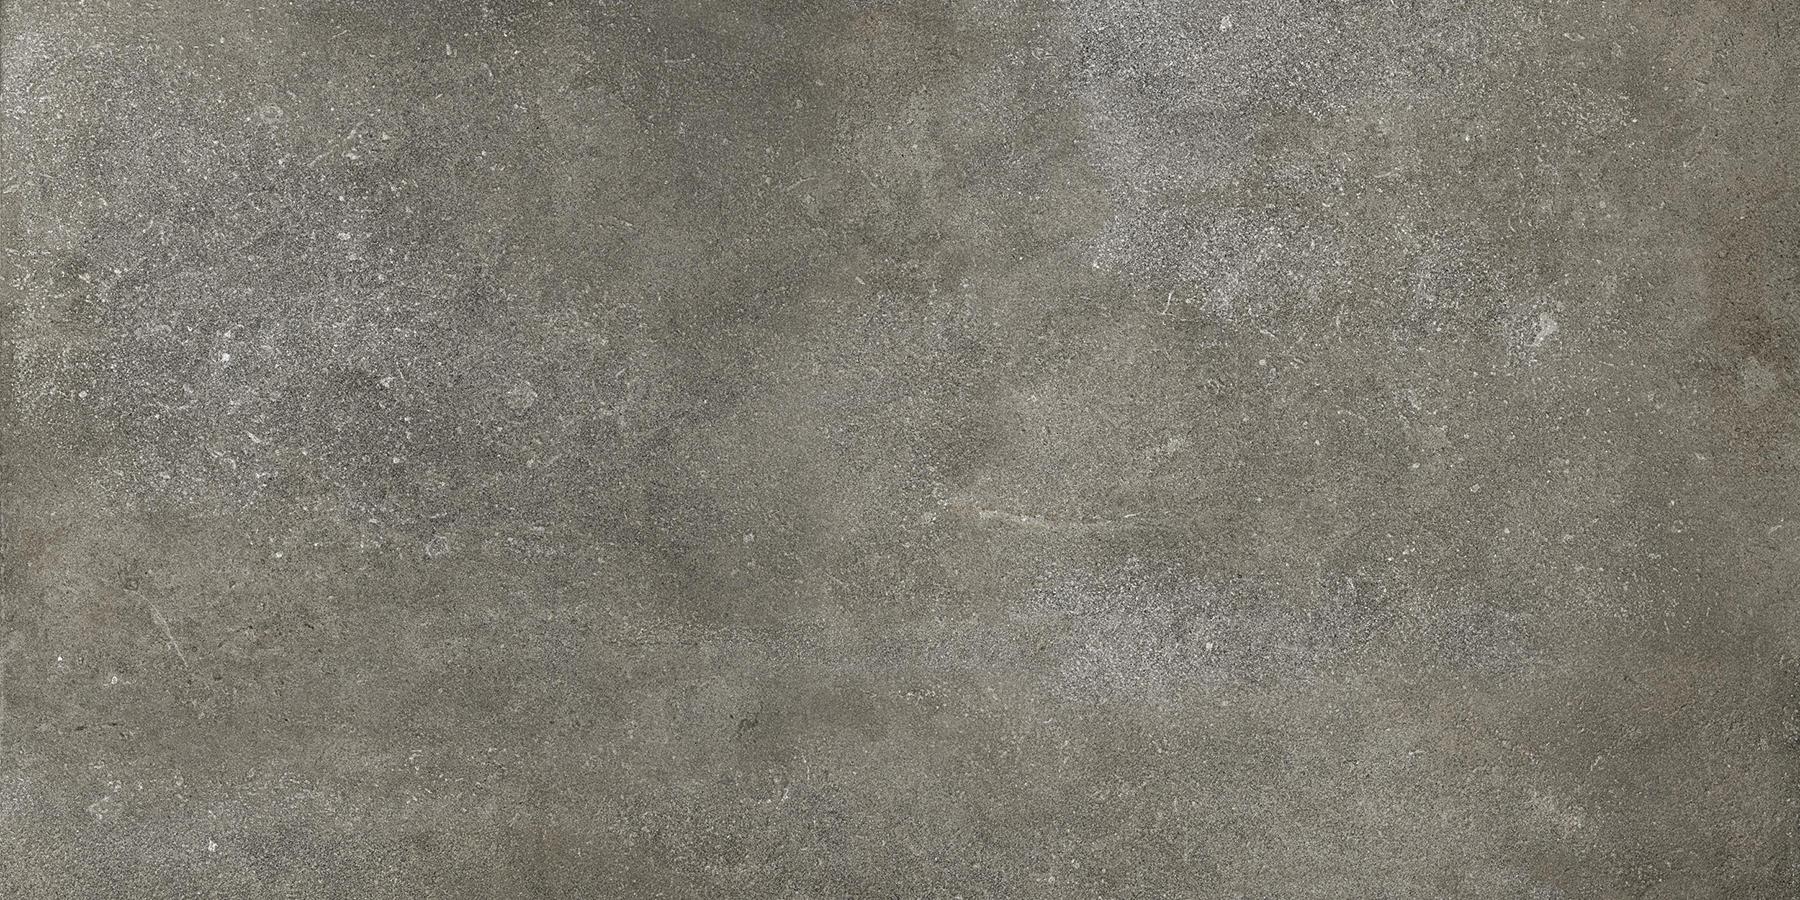 Cinque Tessin scav08r Terrassenplatte Antracite 60x120 matt rett.